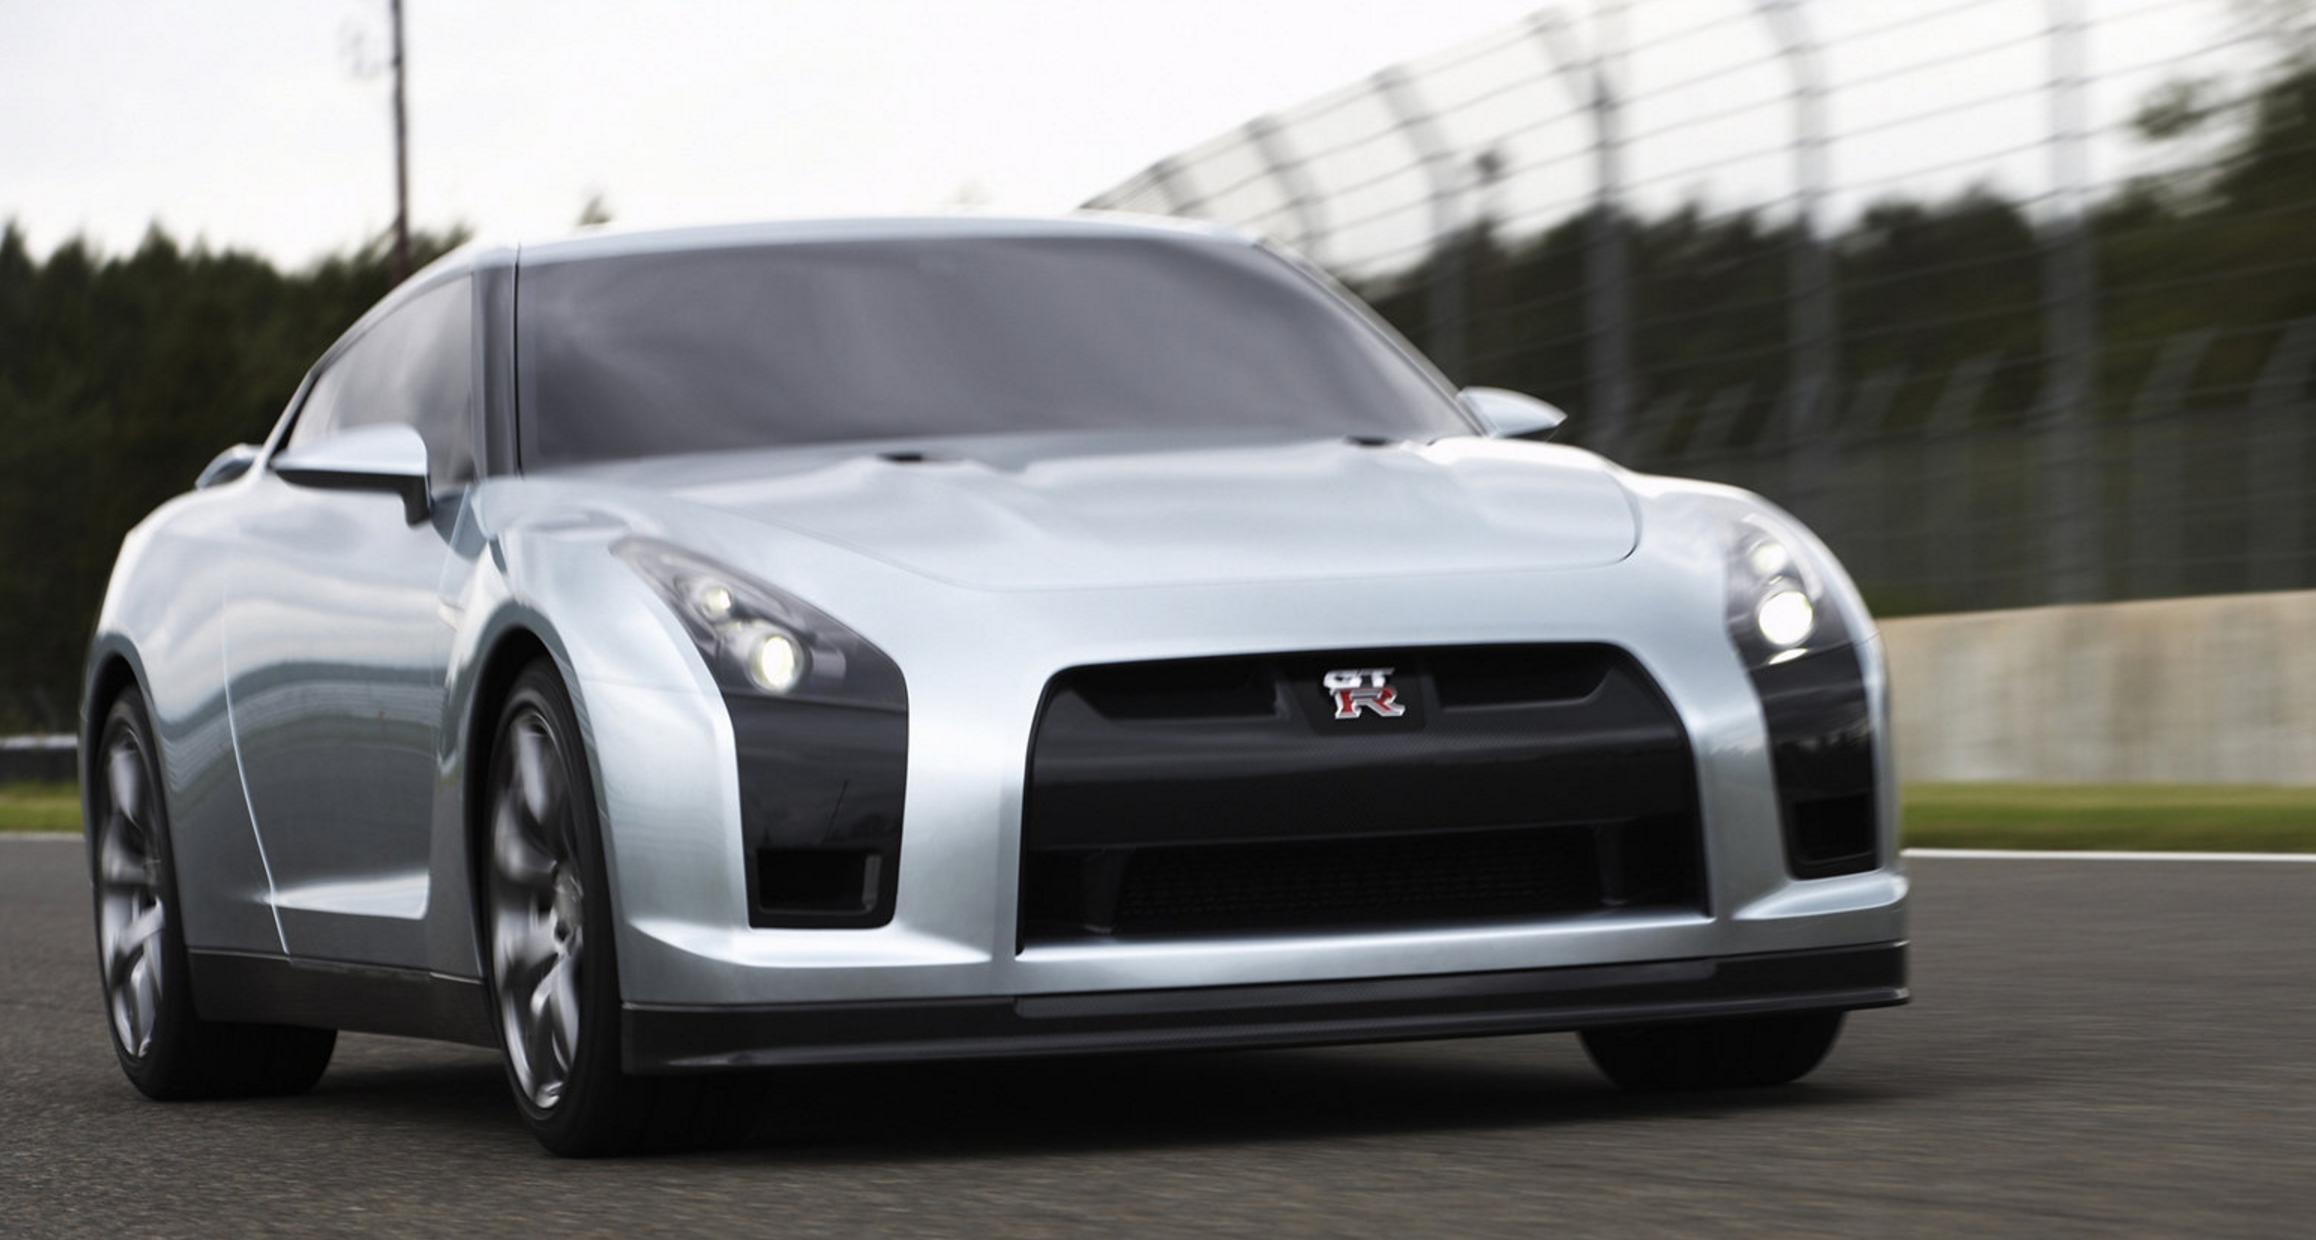 2005 Nissan GT-R Concept | | SuperCars net